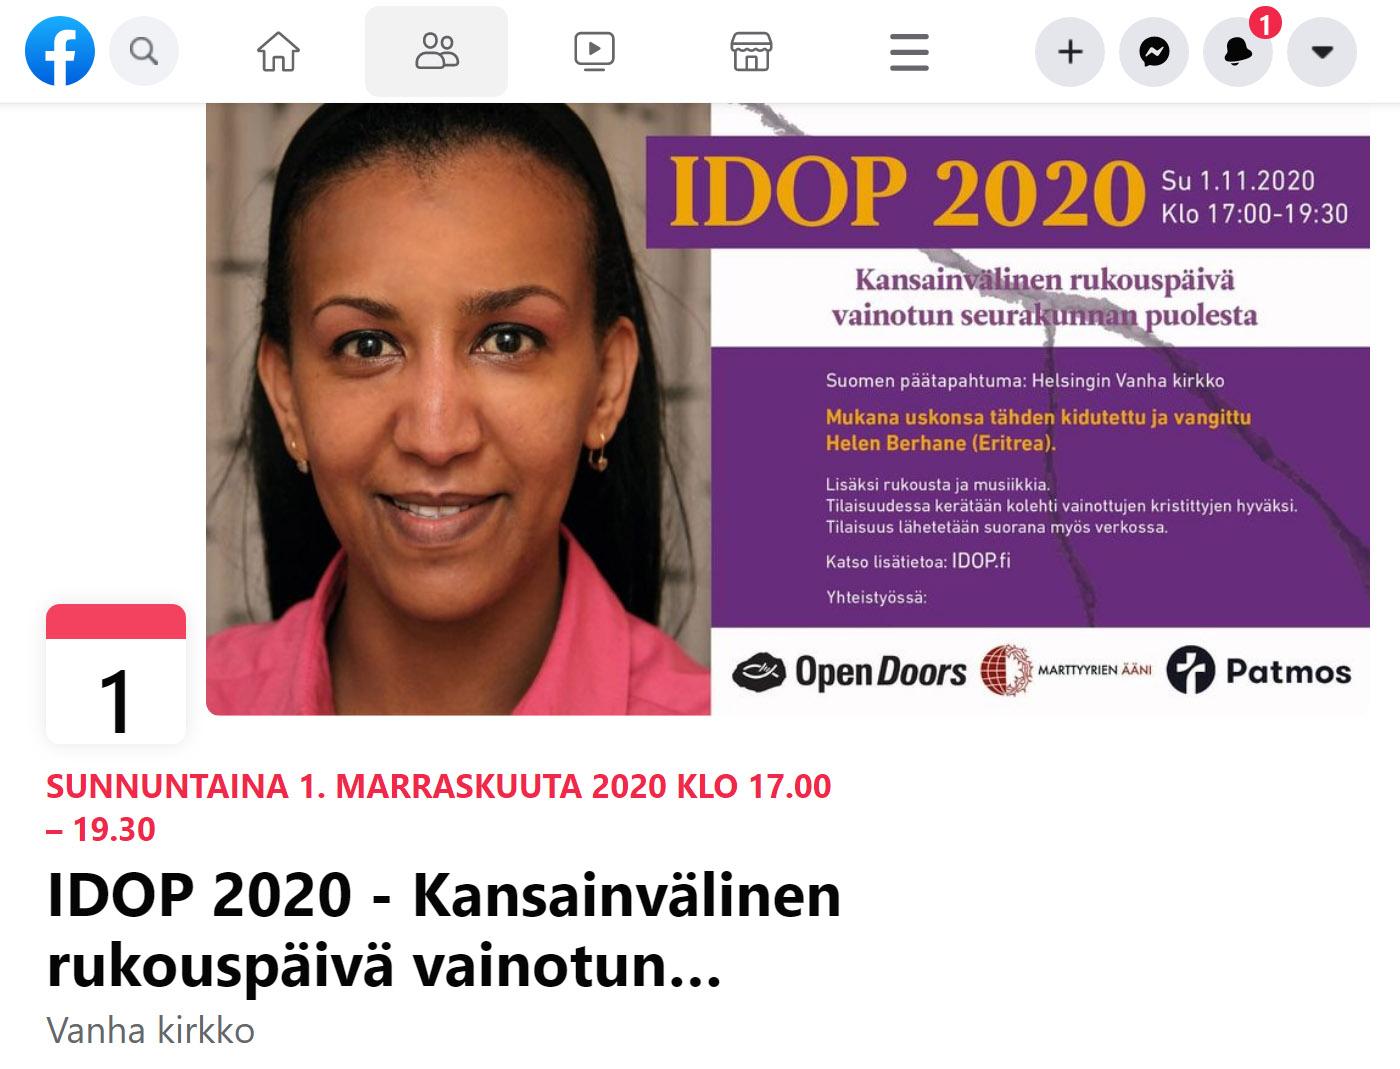 idop2020 facebook event